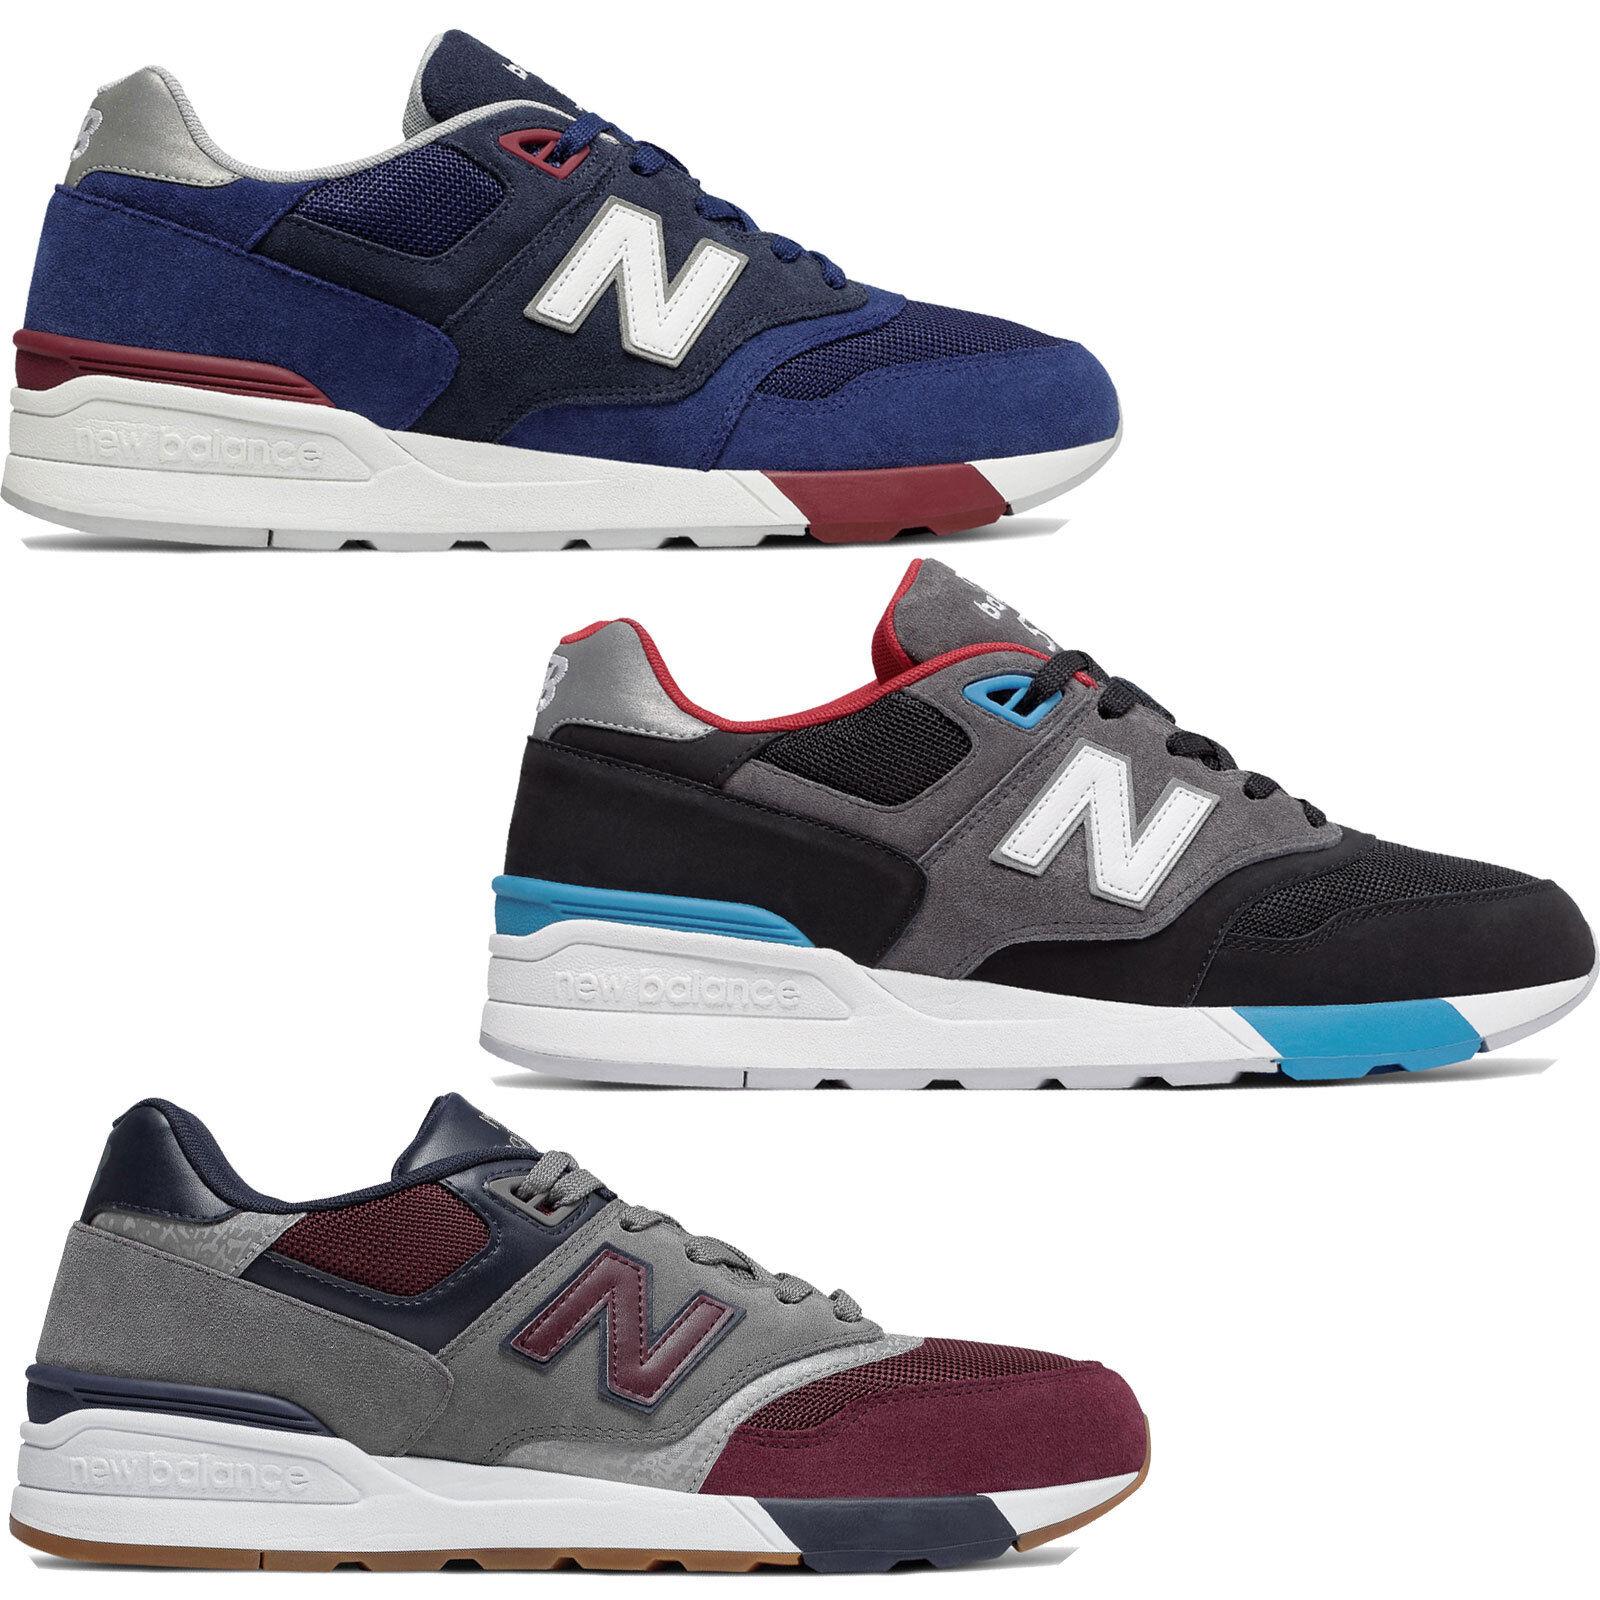 New Balance 597 Herren-Sneaker ML597 Turnschuhe Sportschuhe Halbschuhe NEU